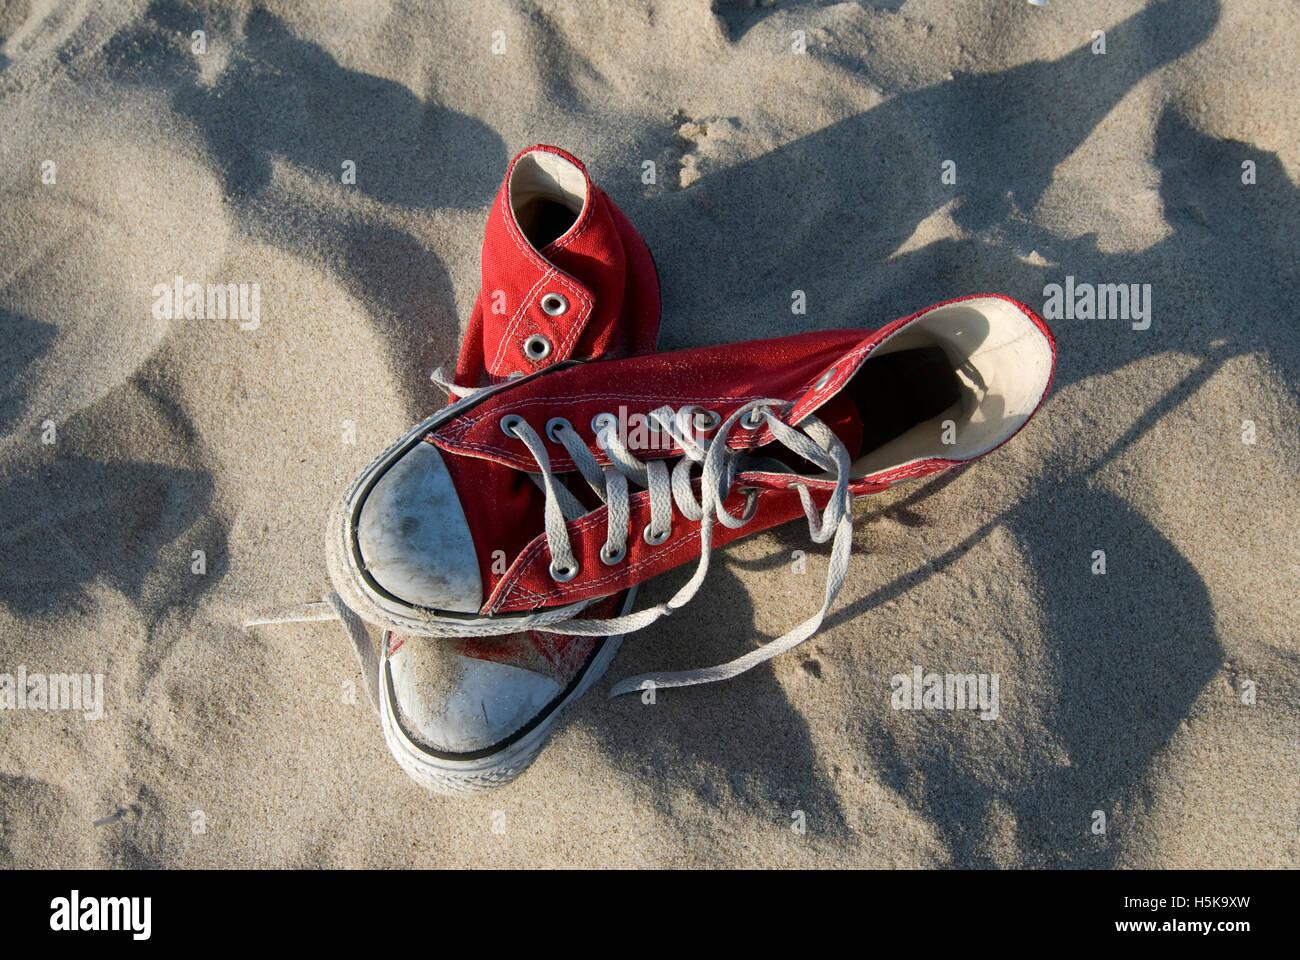 d9c577edef9 Red Converse Chuck Taylor All Star shoe pair. CRWJAA (RM). Red Converse   Chucks